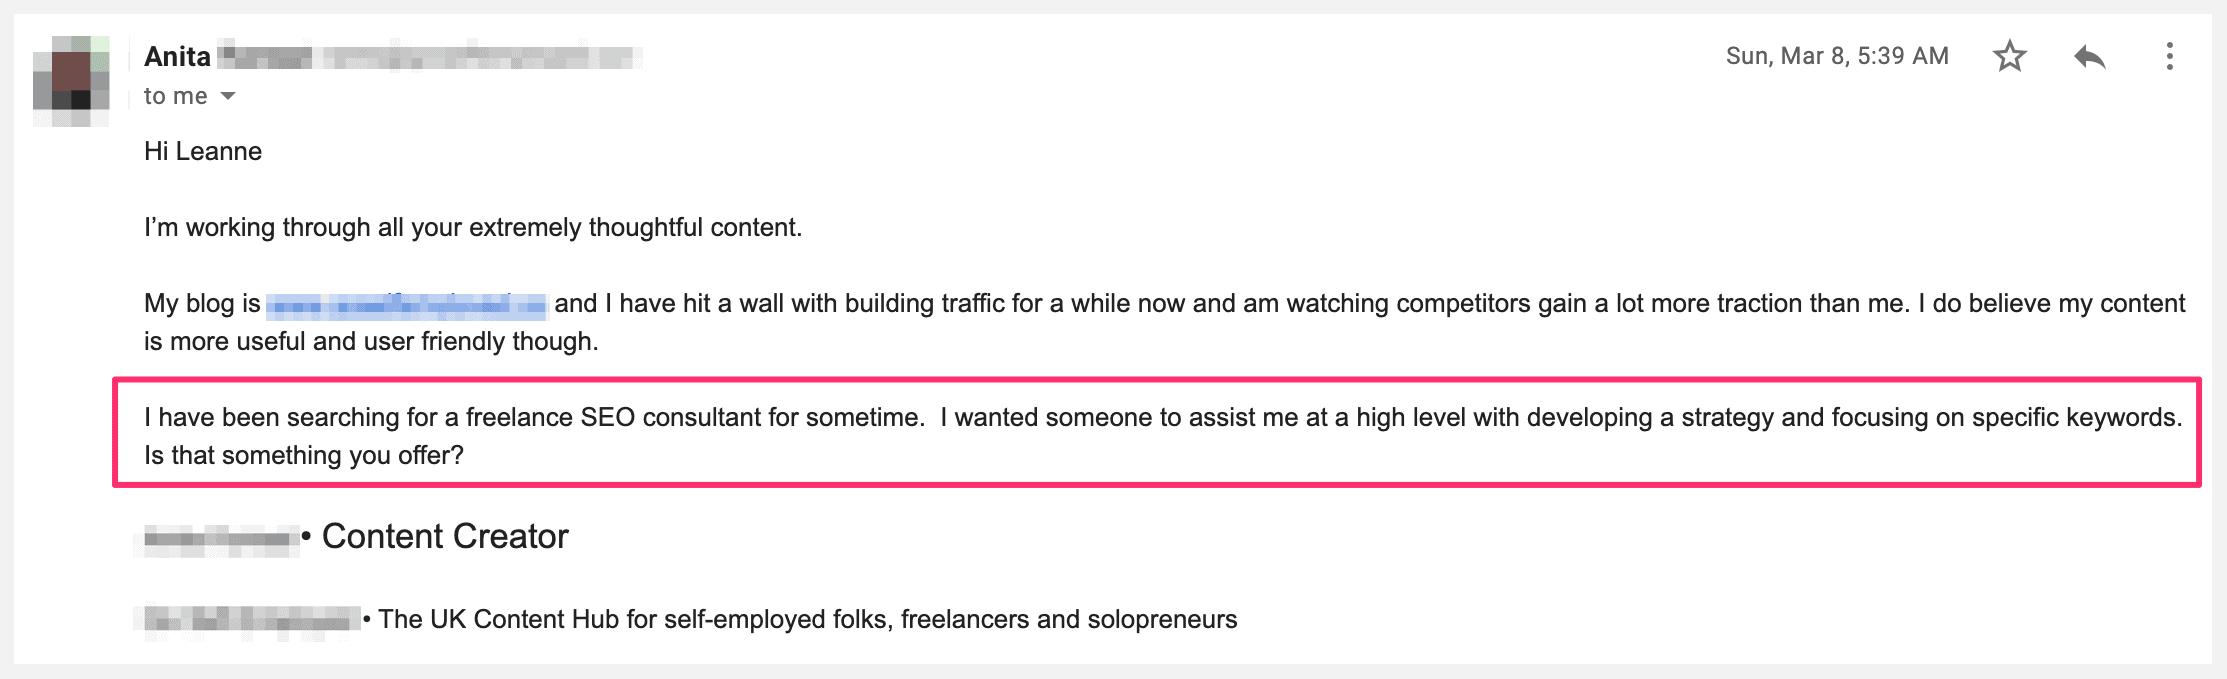 seo enquiry client feedback